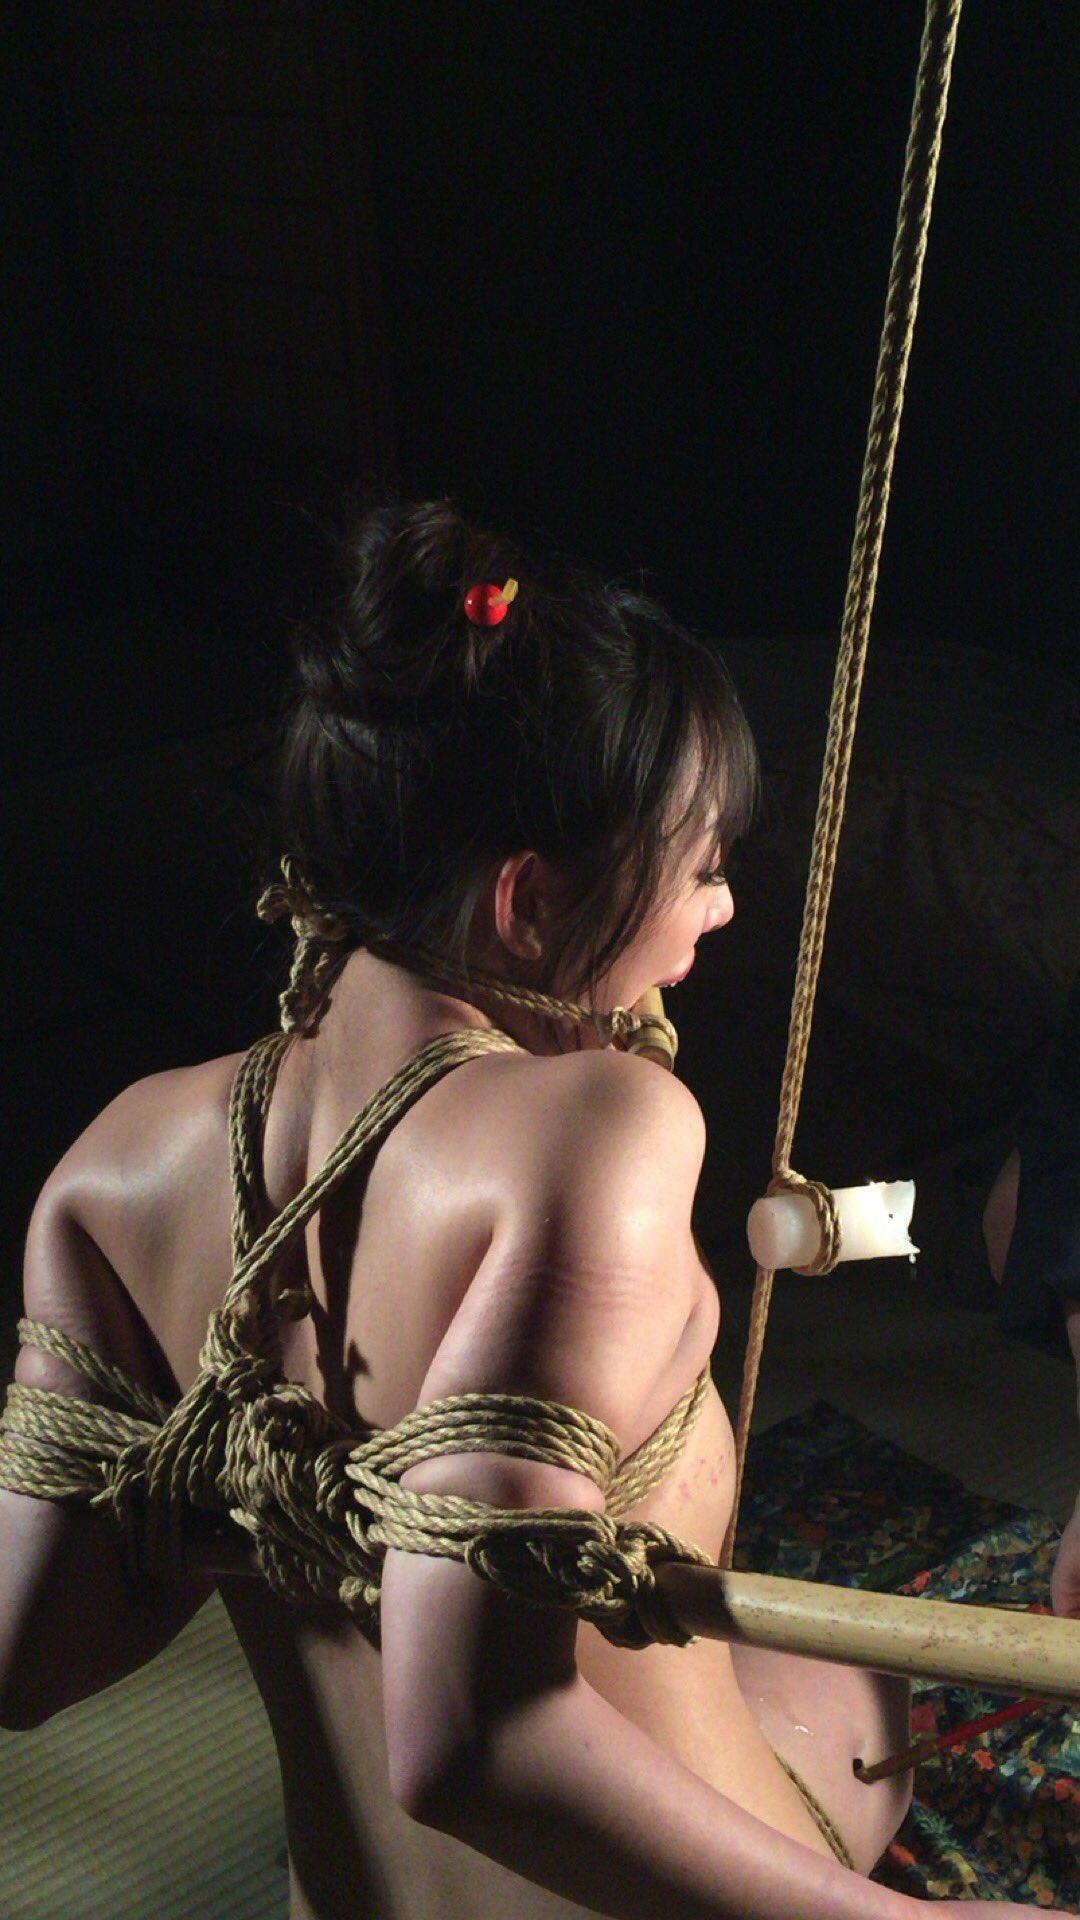 緊縛tumblr.com bondage yu kawakami 1280.jpg kinbaku-sajiki